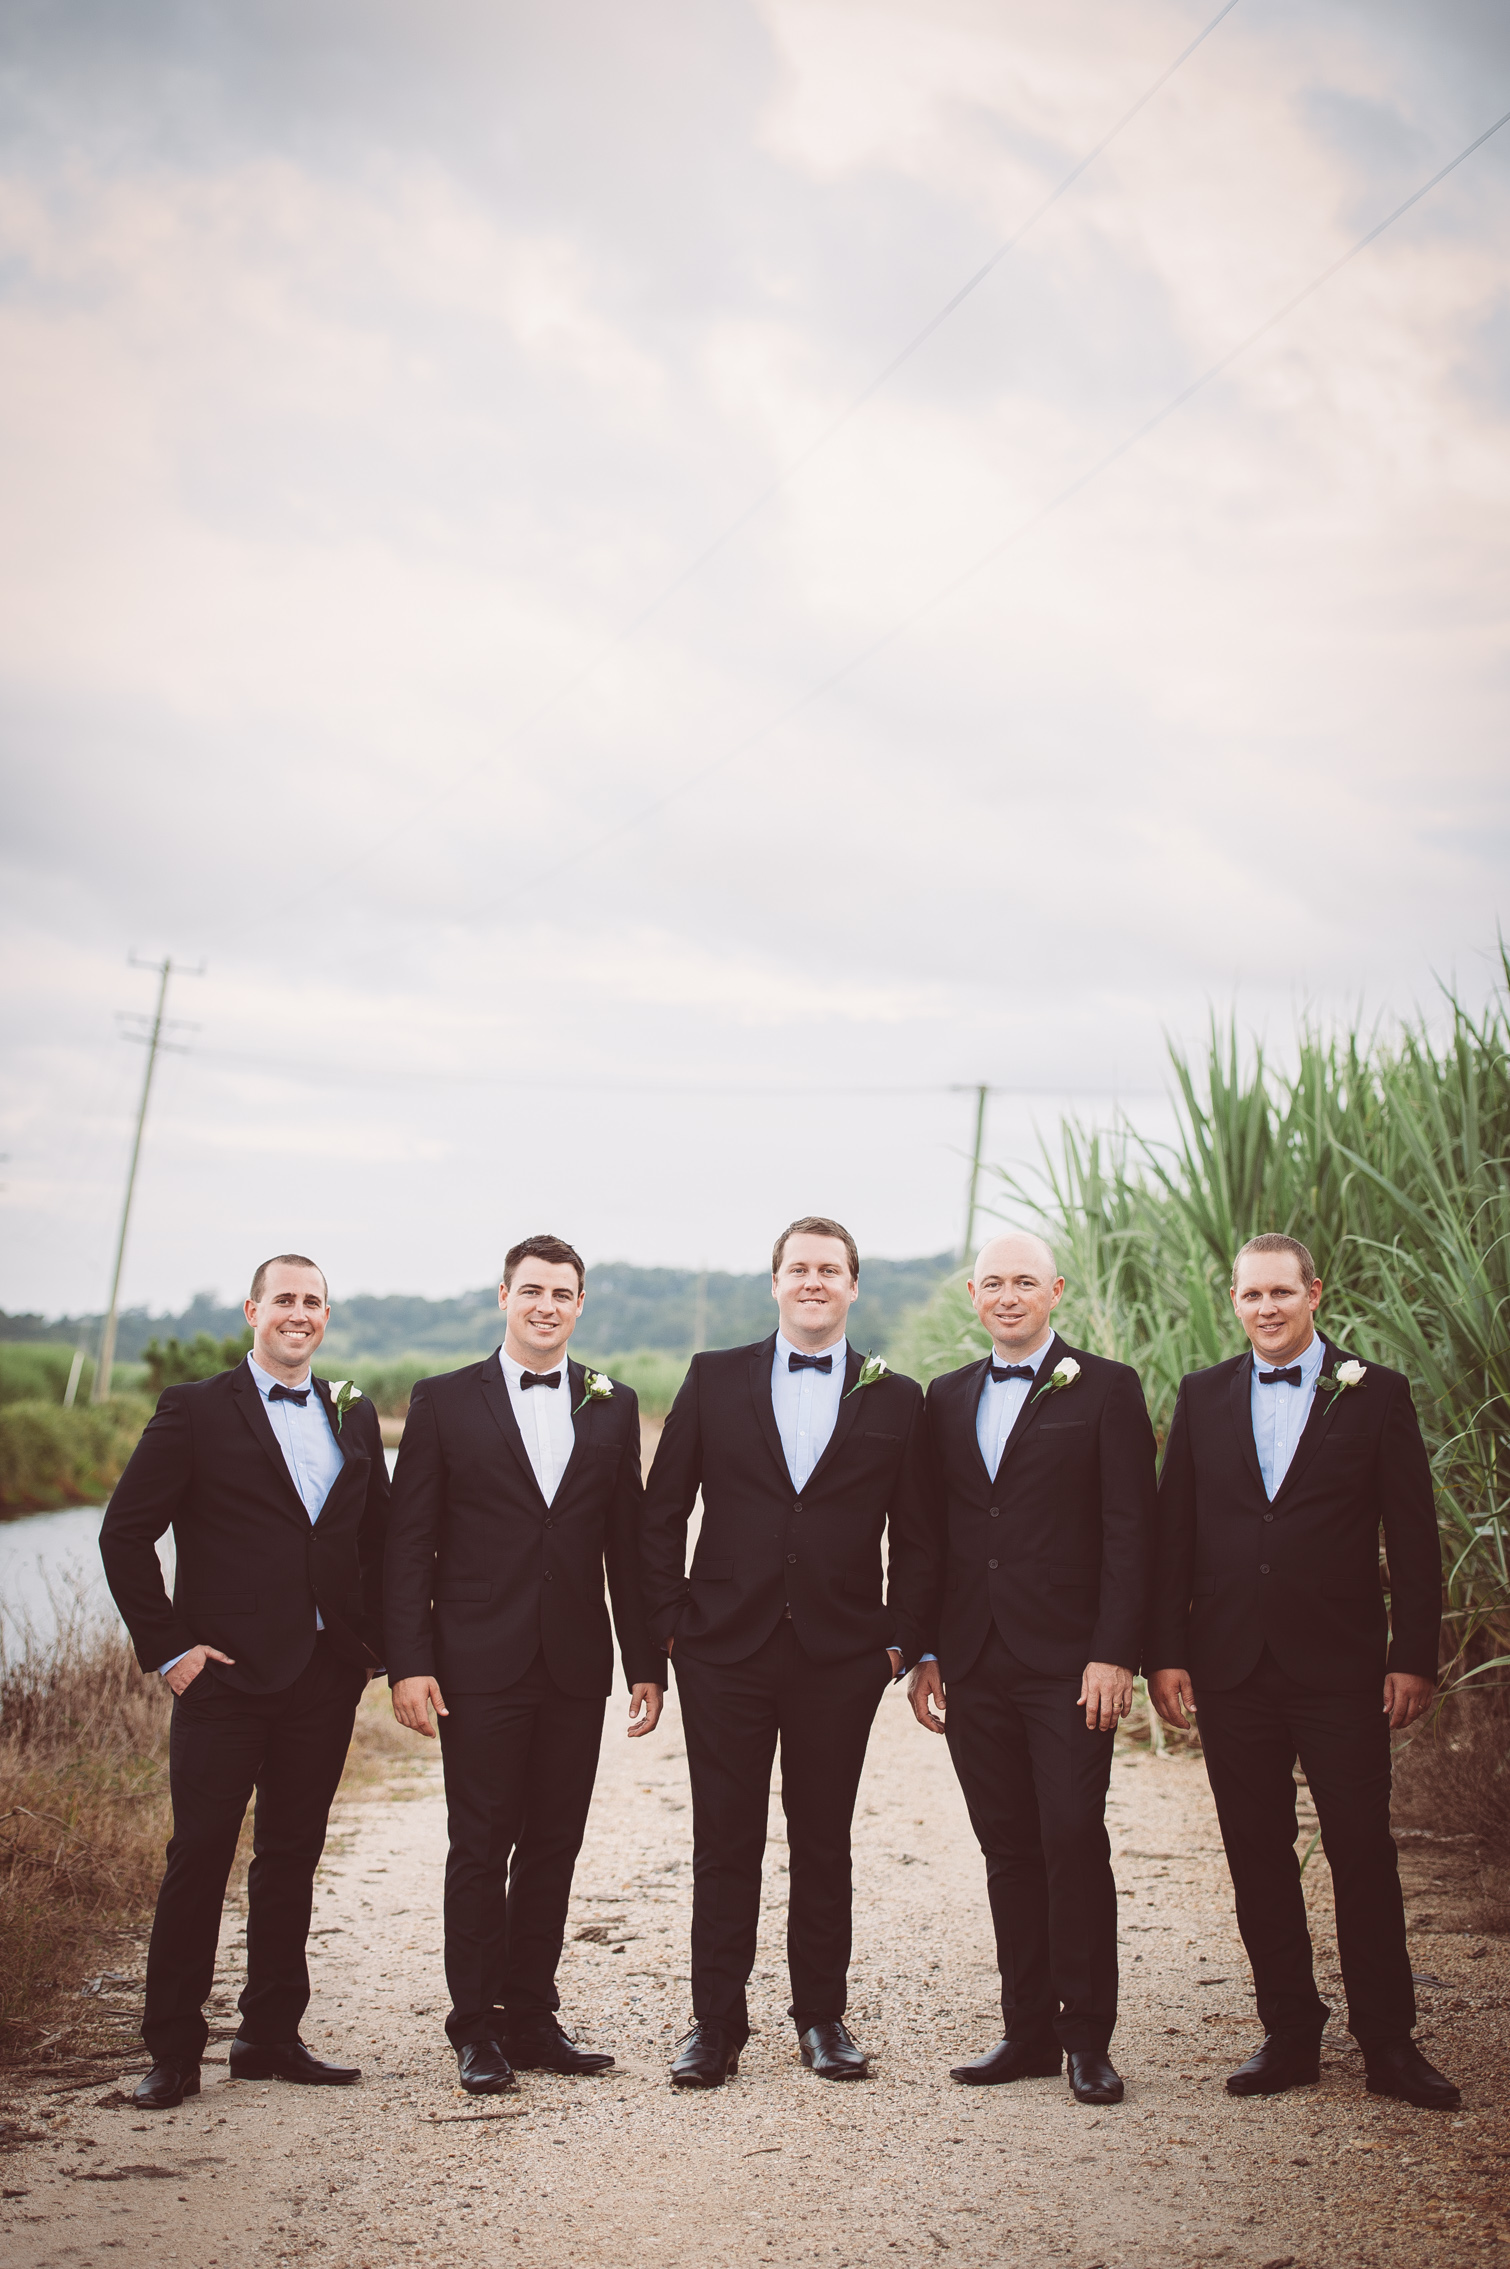 Osteria wedding_New Black Studios 43.jpg